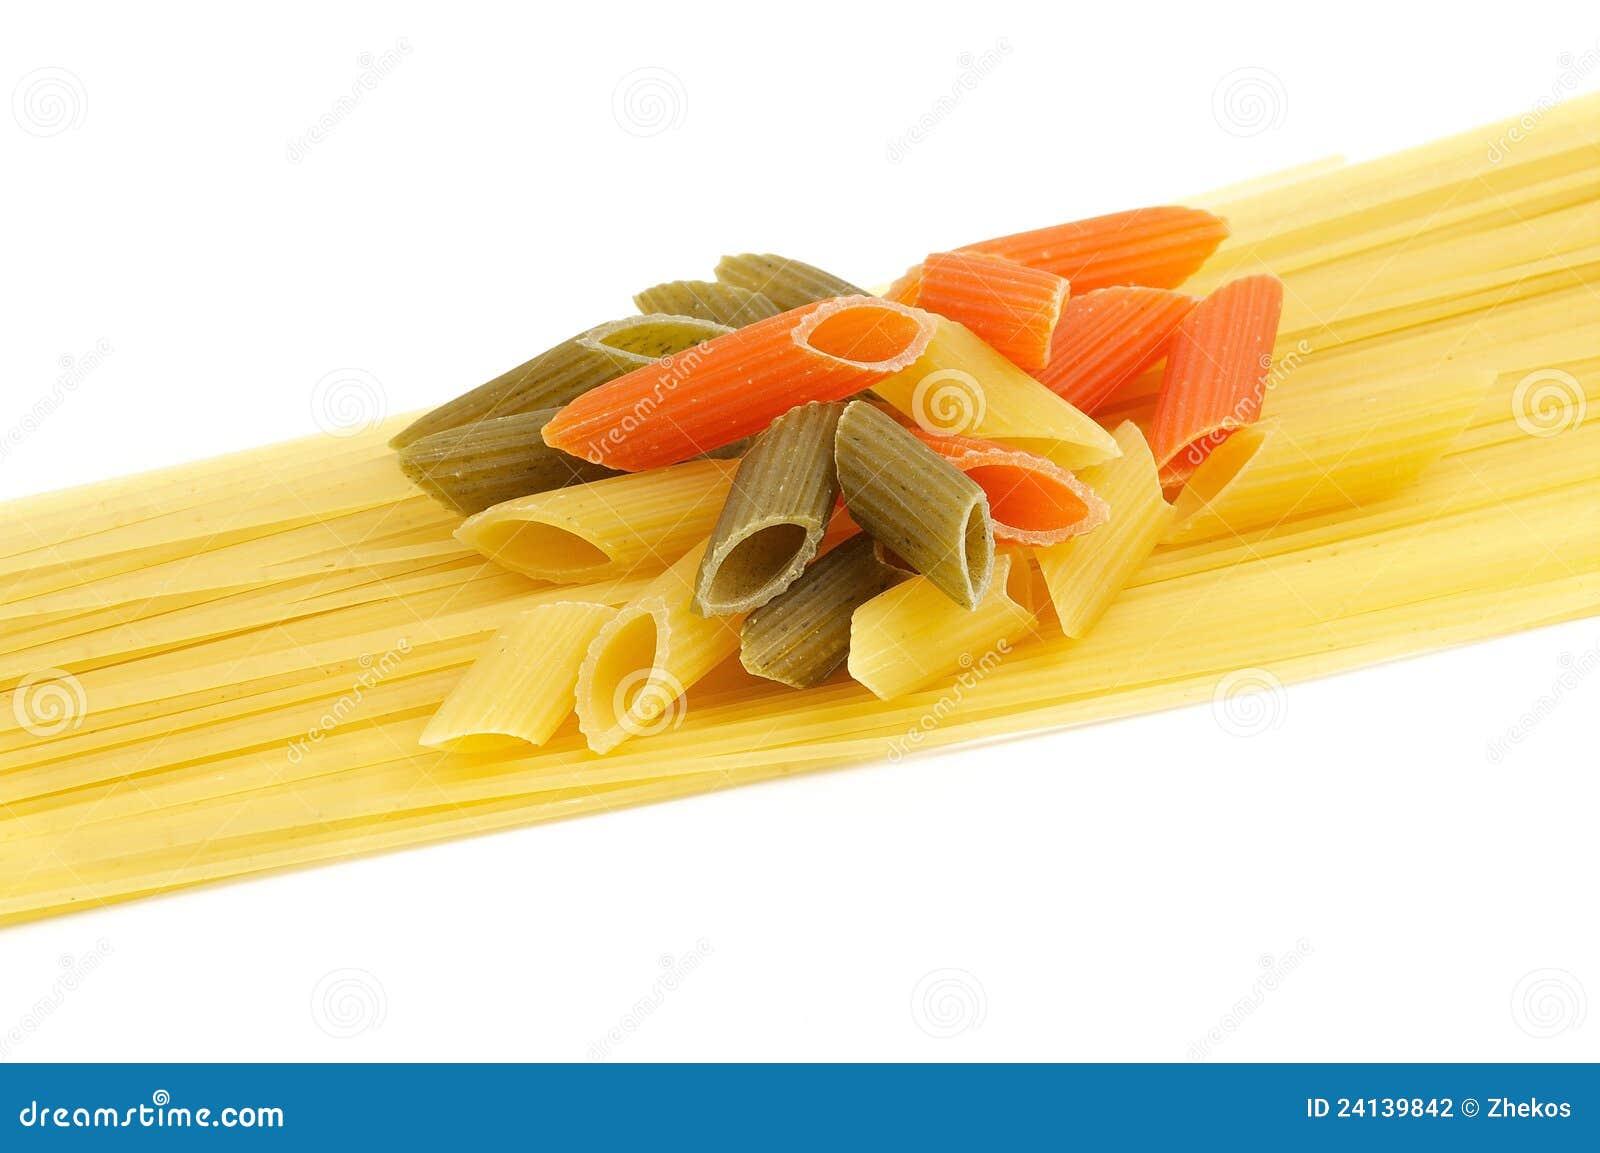 italian pasta spaghetti and penne rigate tricolore stock photography image 24139842. Black Bedroom Furniture Sets. Home Design Ideas